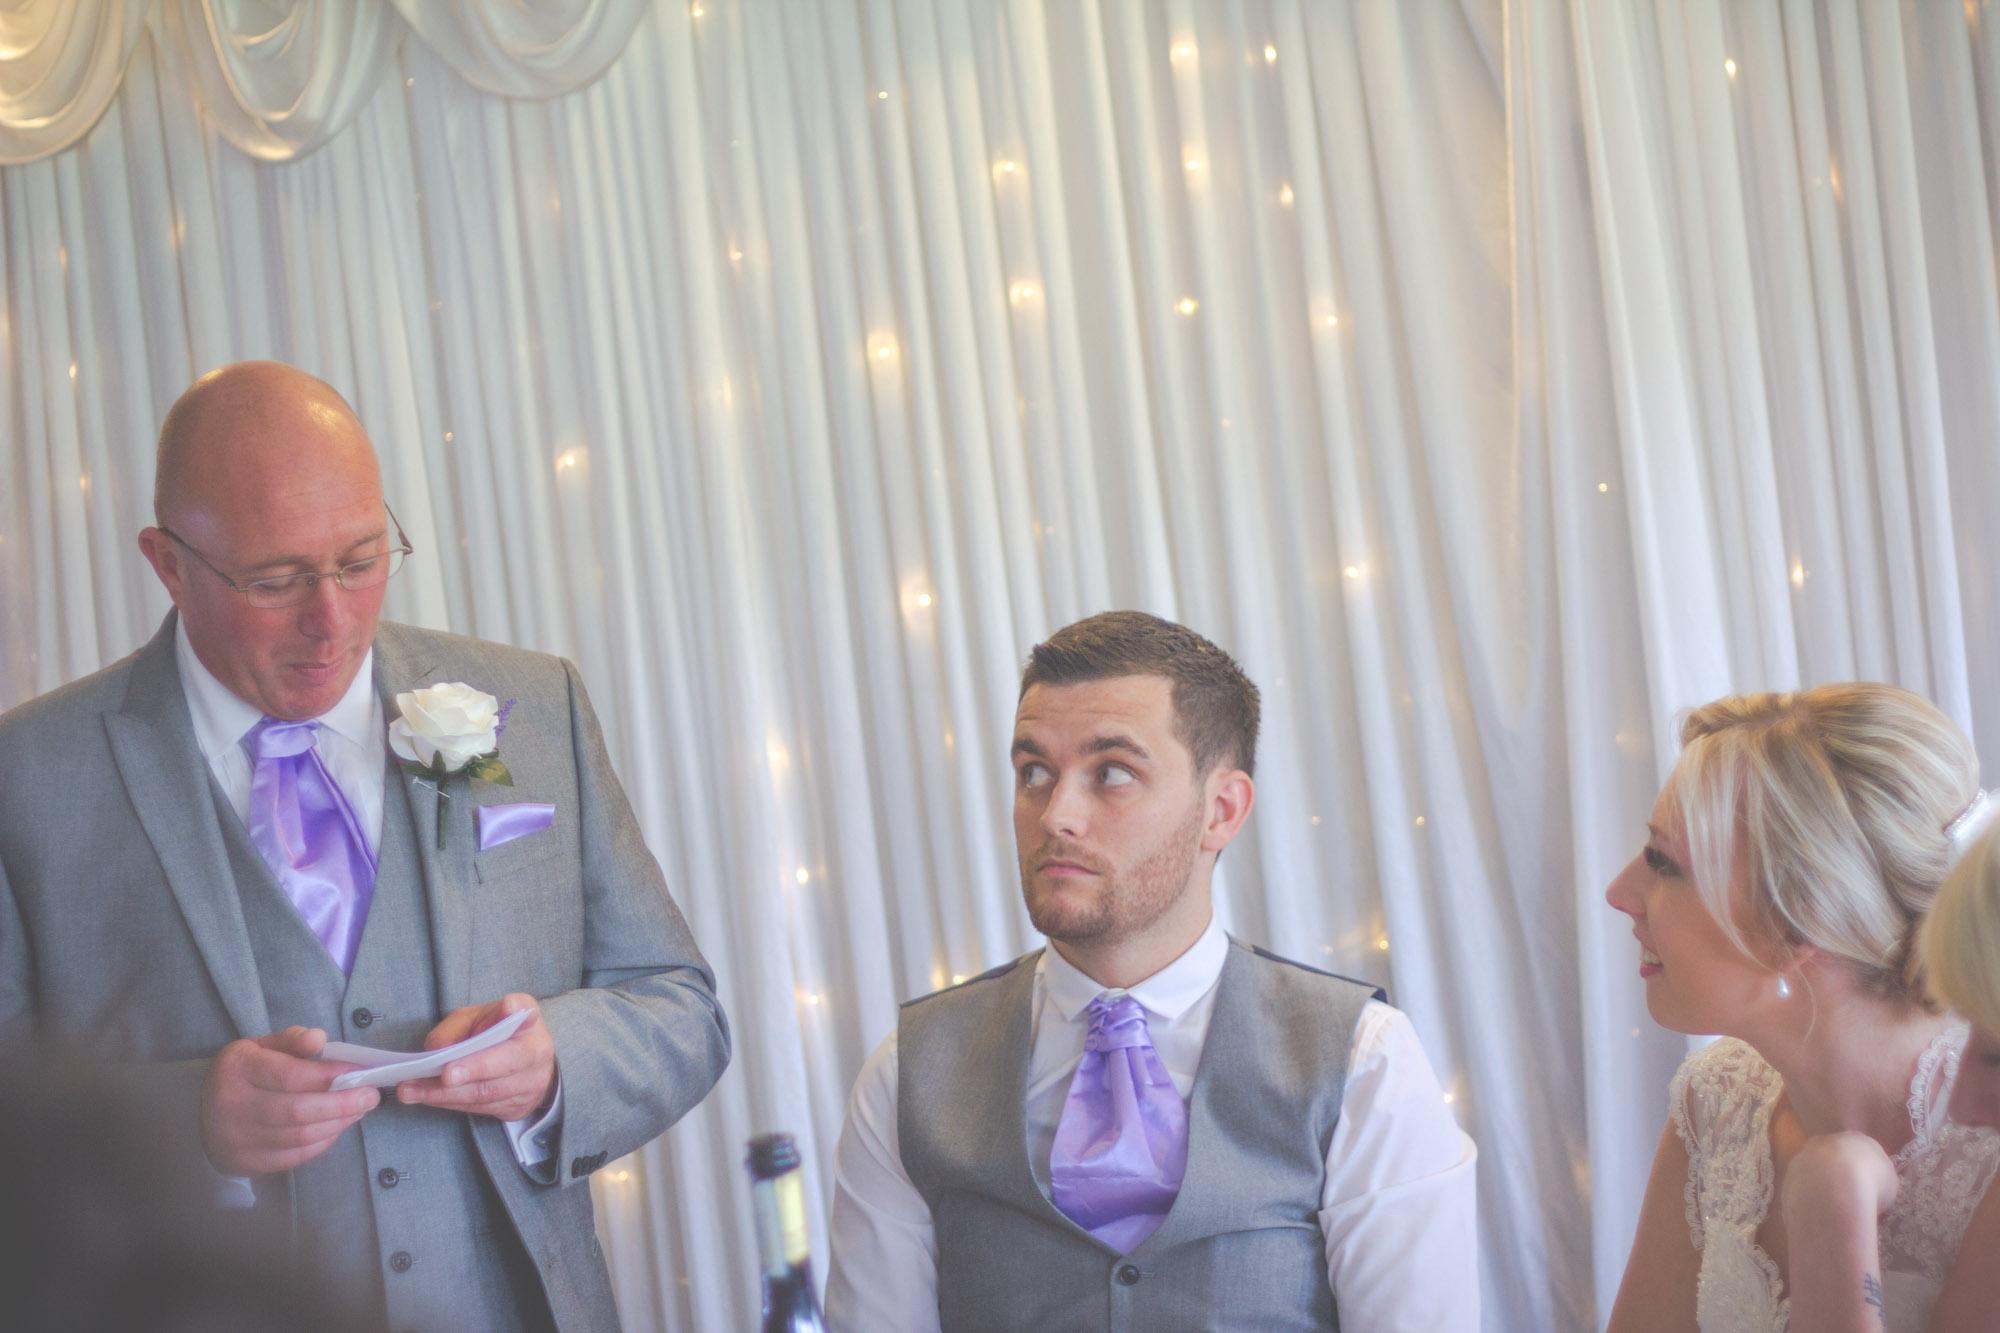 skipton-registry-office-wedding-photography-49.jpg